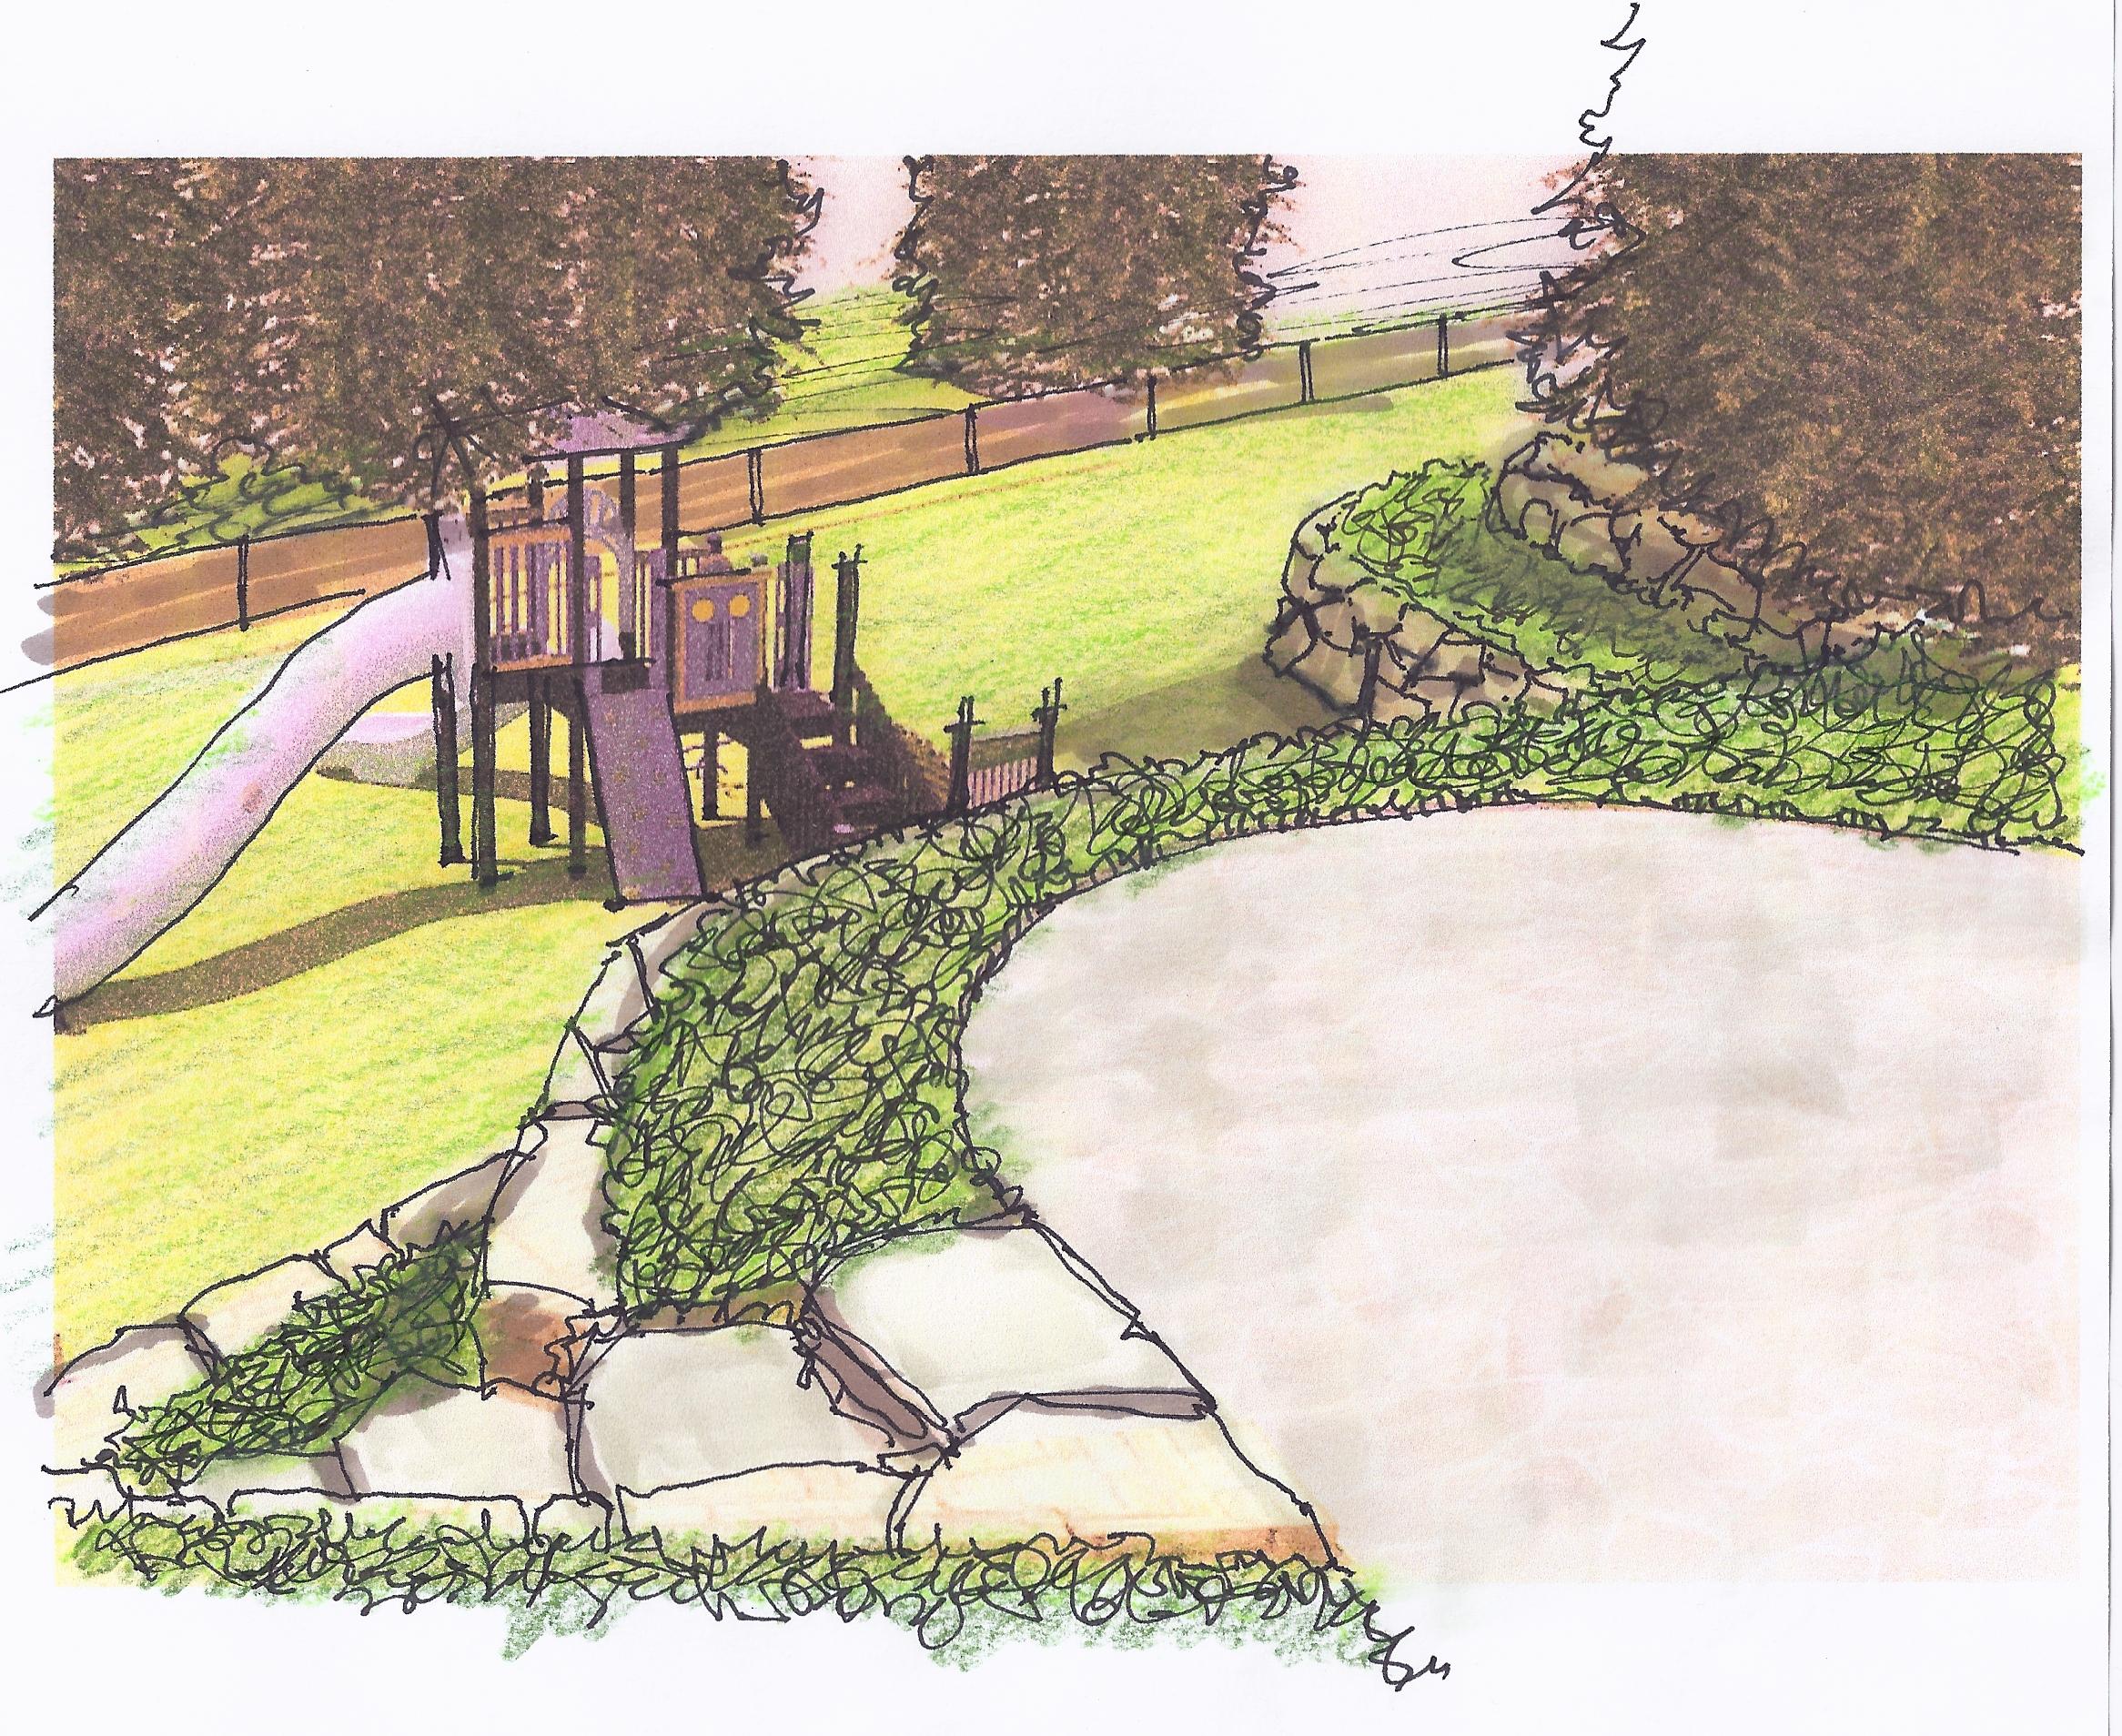 Manhasset Play Area Concept - Render 1